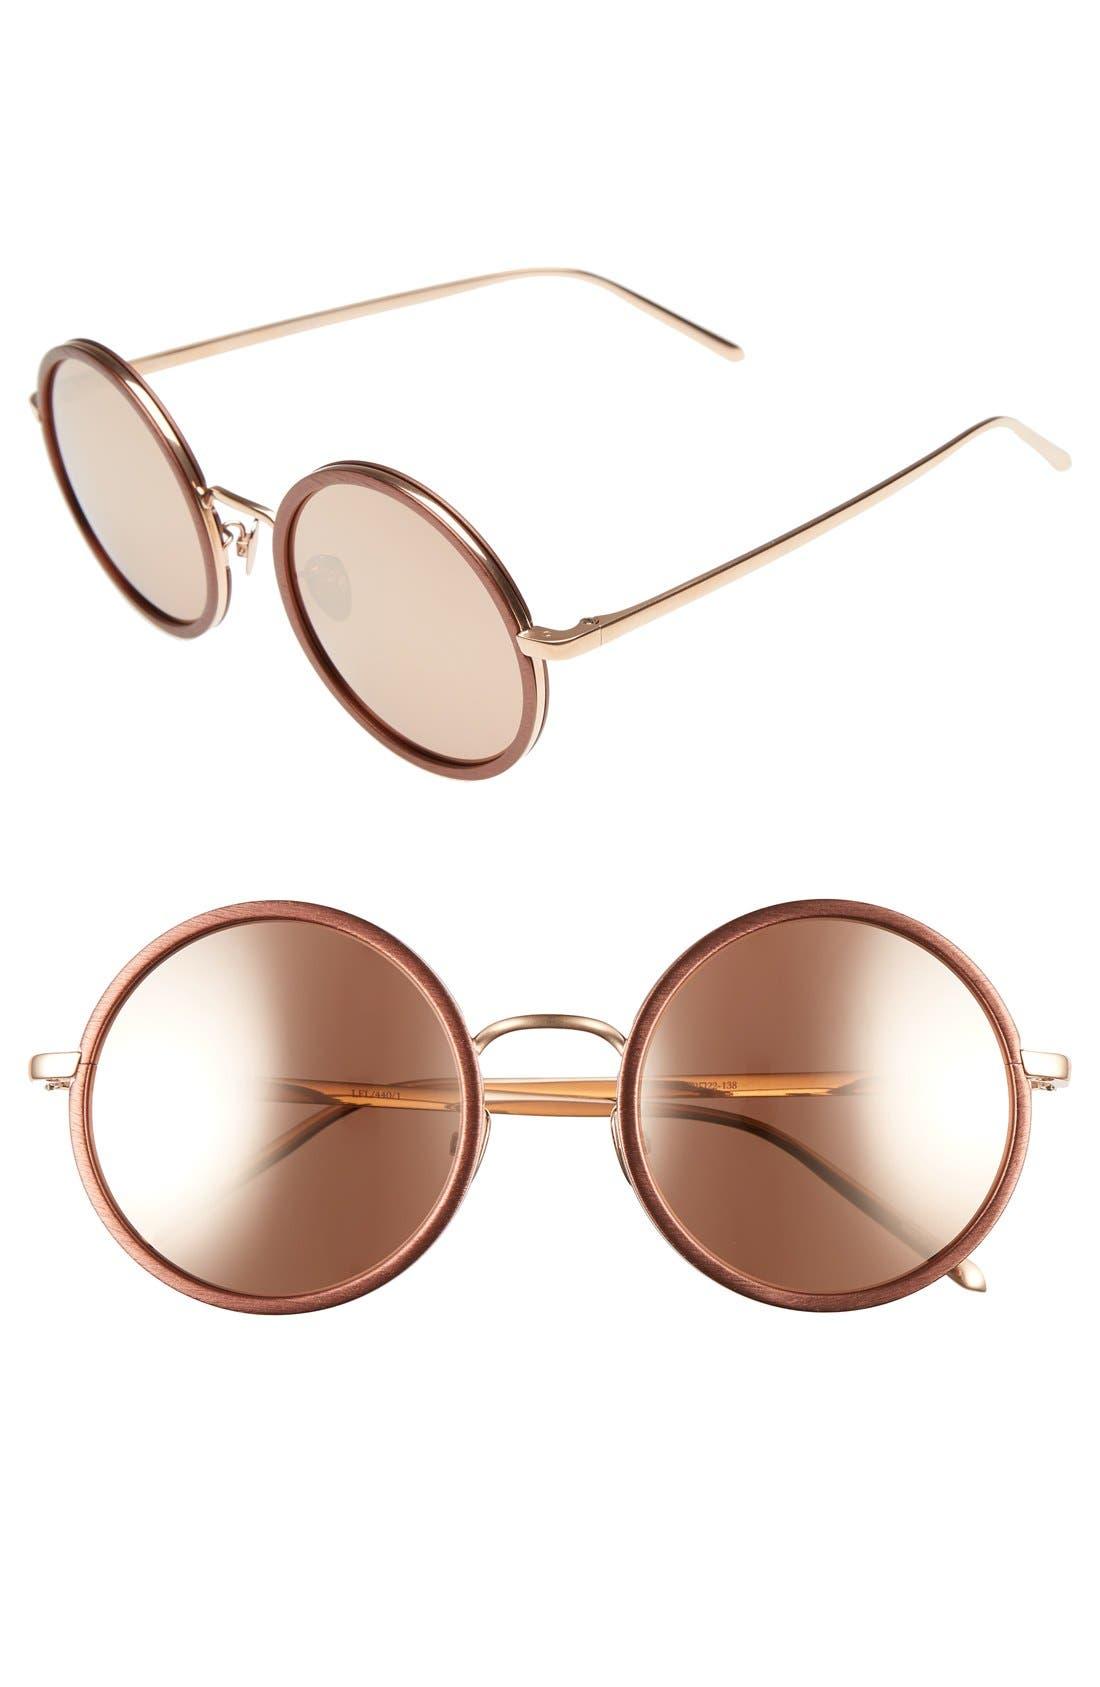 52mm Round 18 Karat Rose Gold Trim Sunglasses,                         Main,                         color, 221